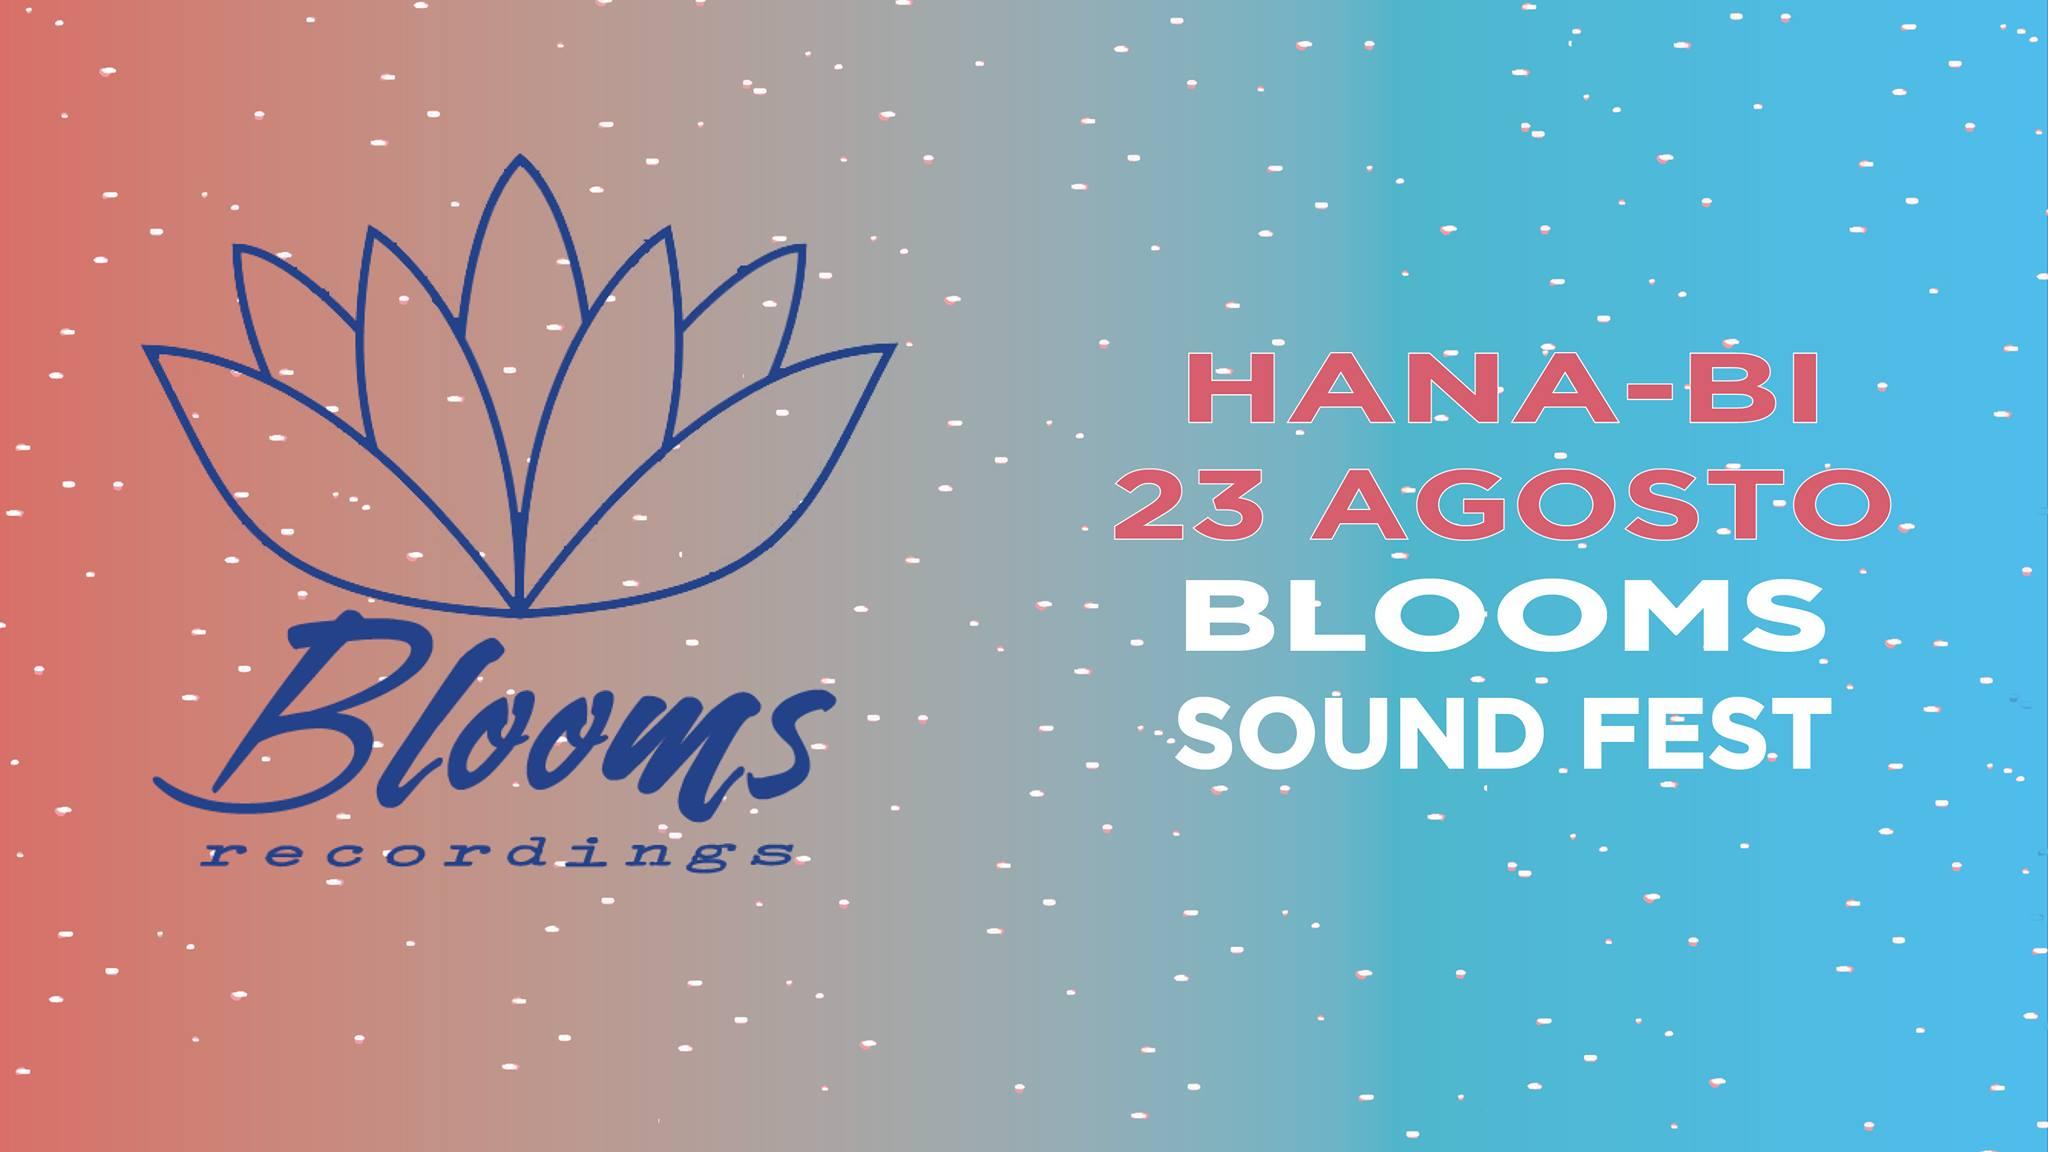 Blooms sound fest